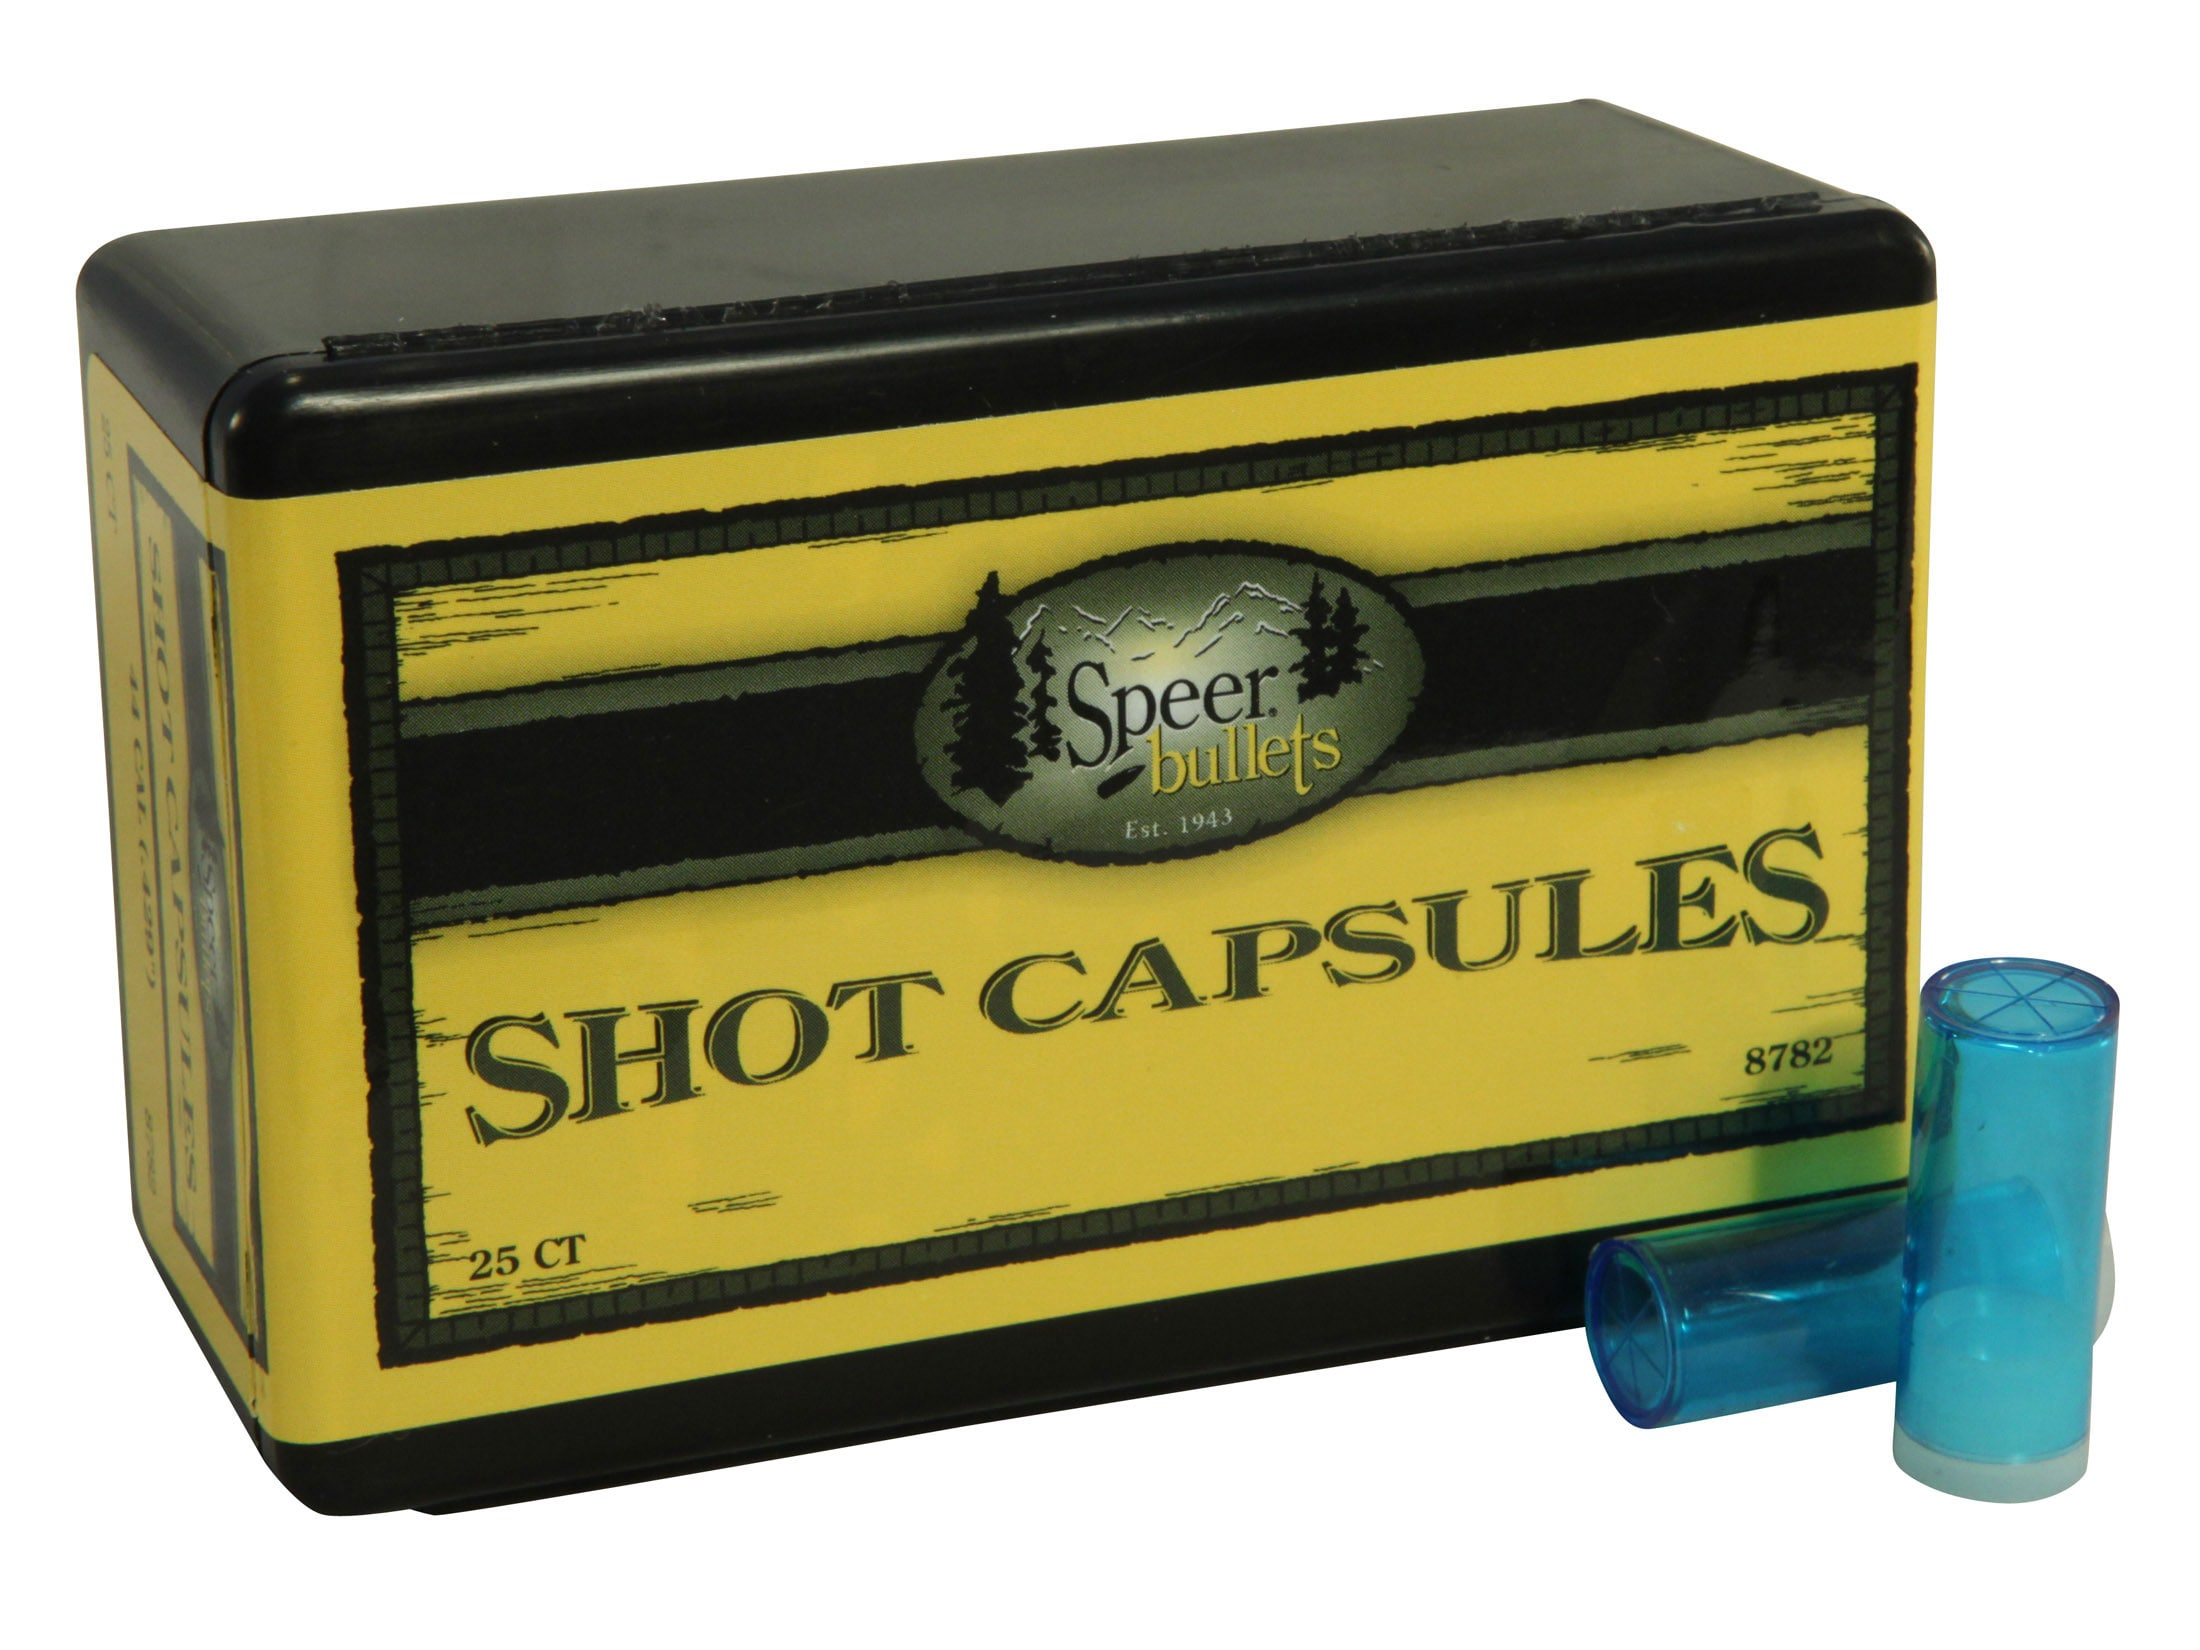 Speer Empty Shot Capsules 44 Cal Box of 25